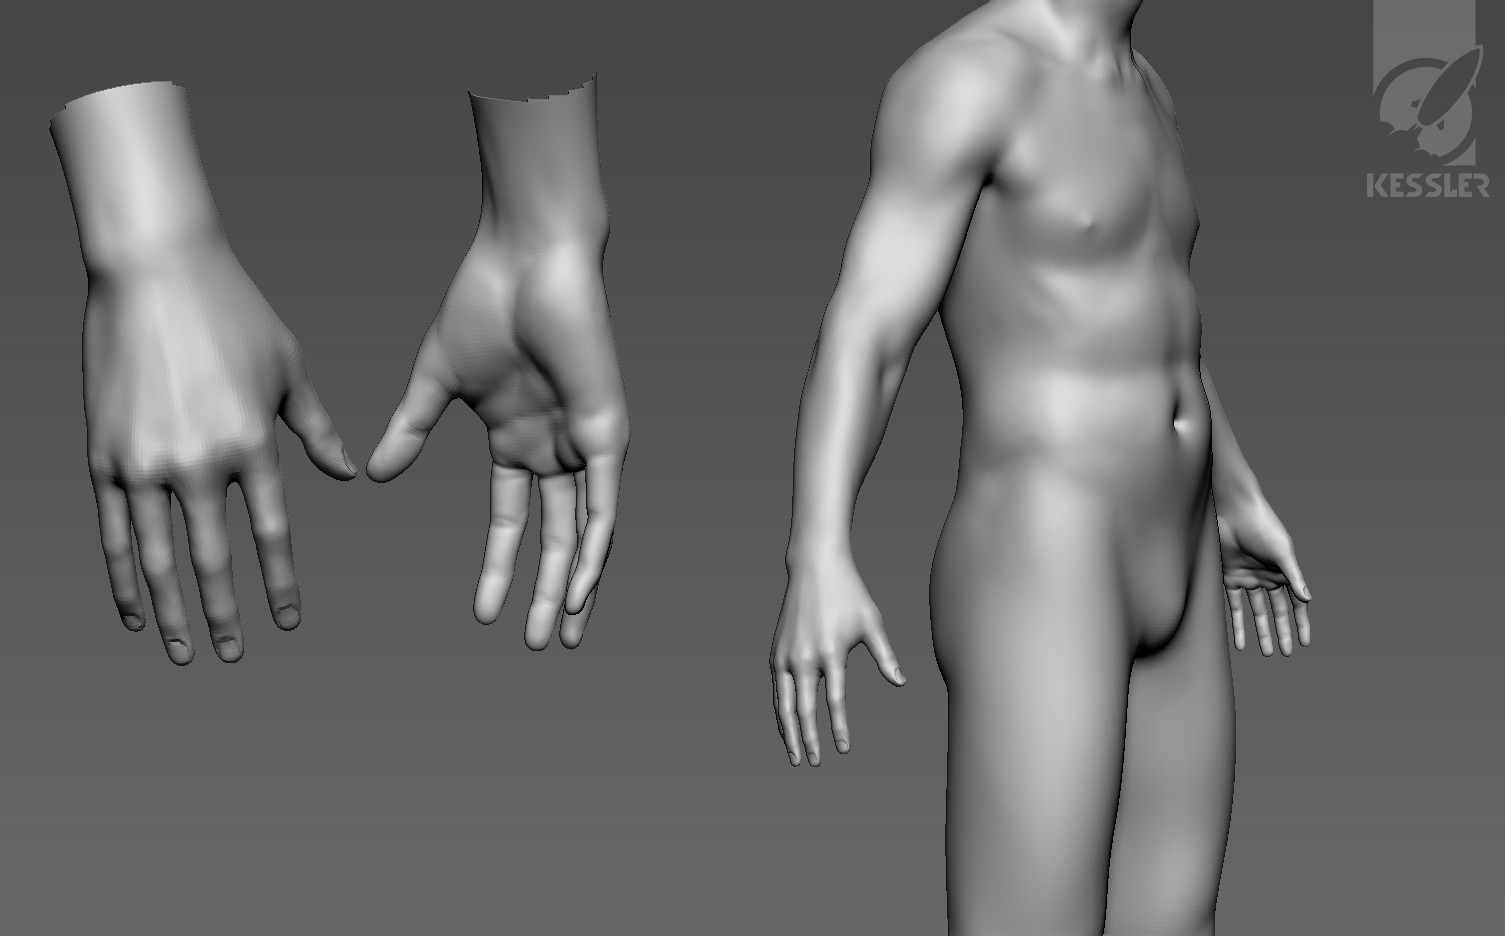 Nick rutledge hands